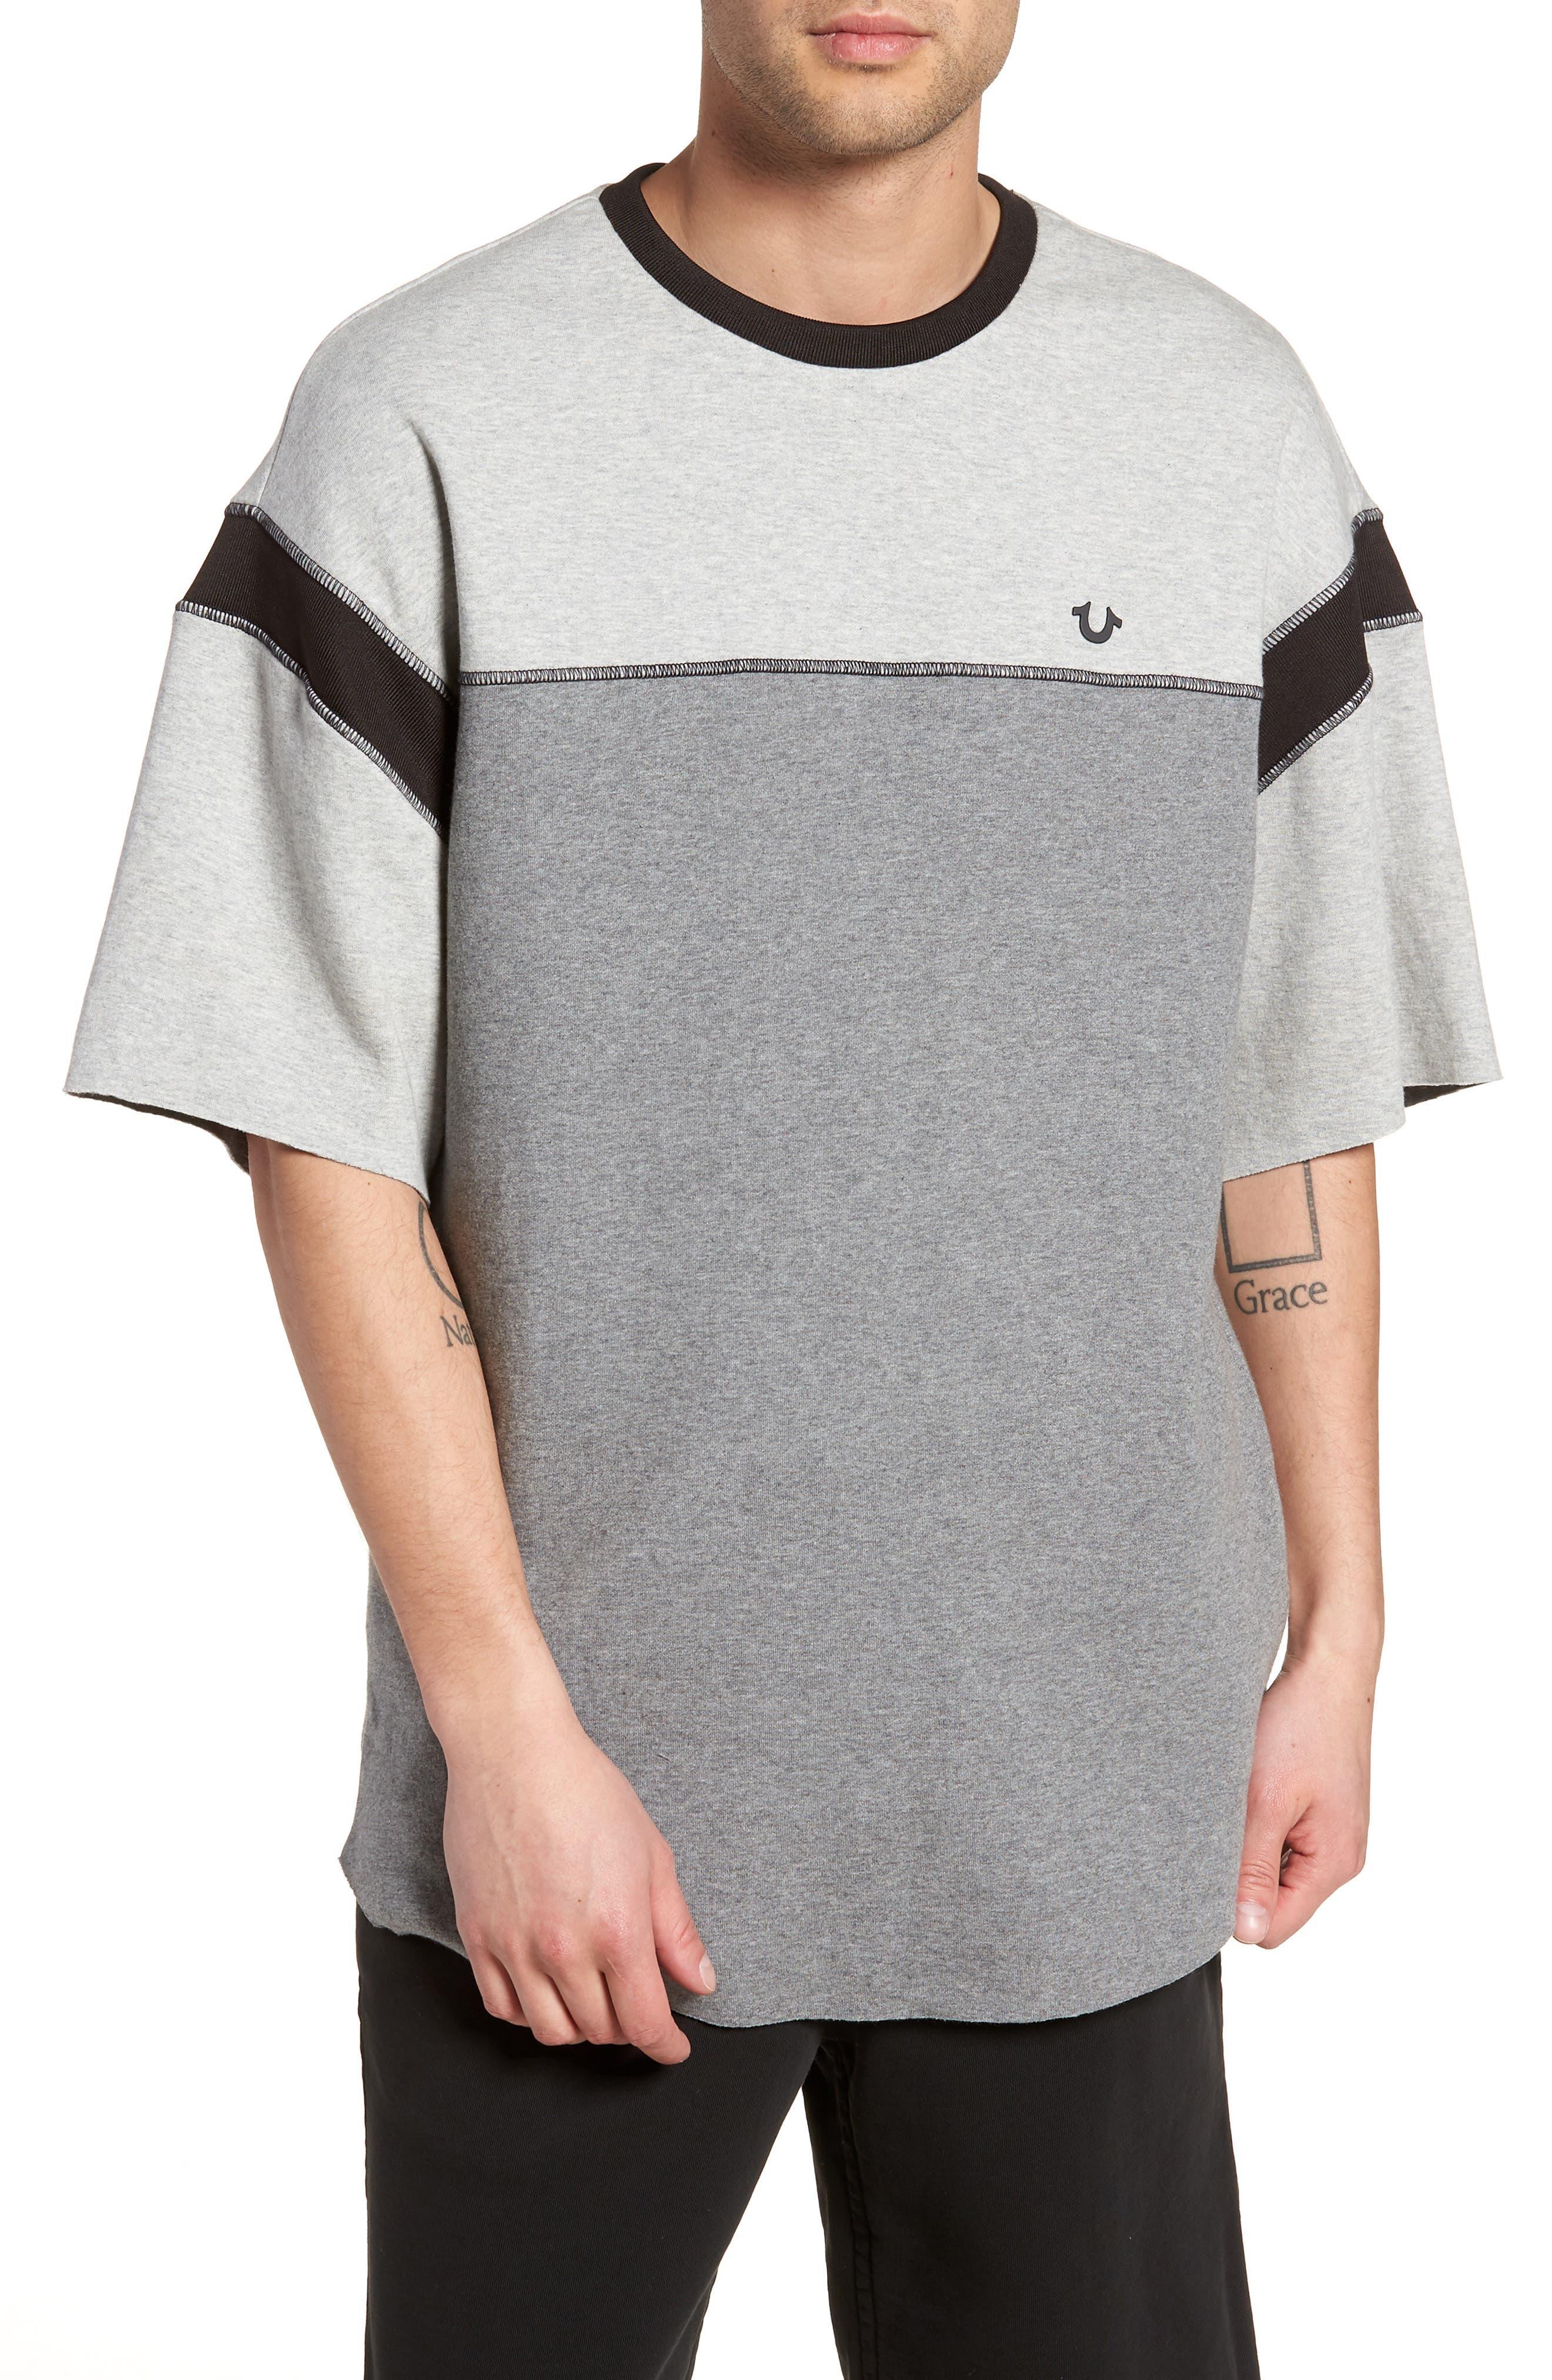 True Religion Brand Jeans Football T-Shirt